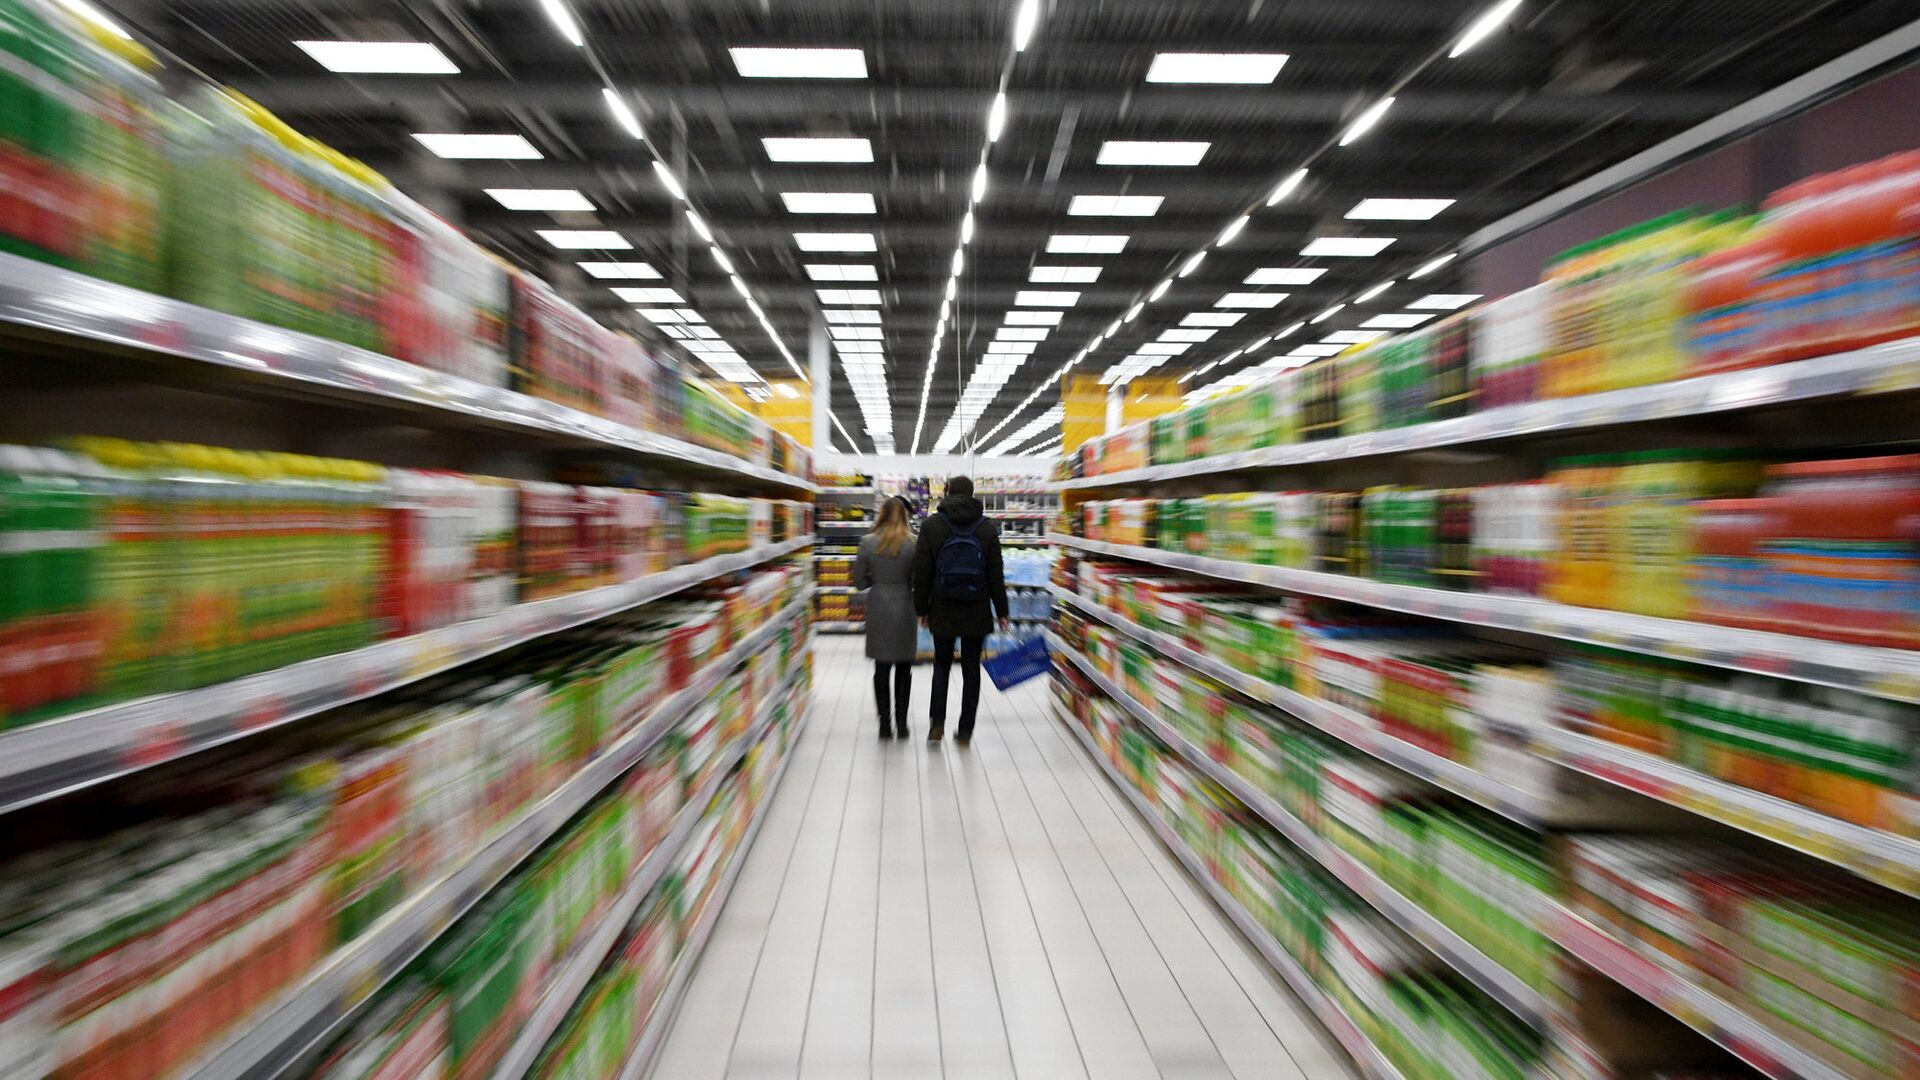 Покупатели в супермаркете - РИА Новости, 1920, 20.09.2021